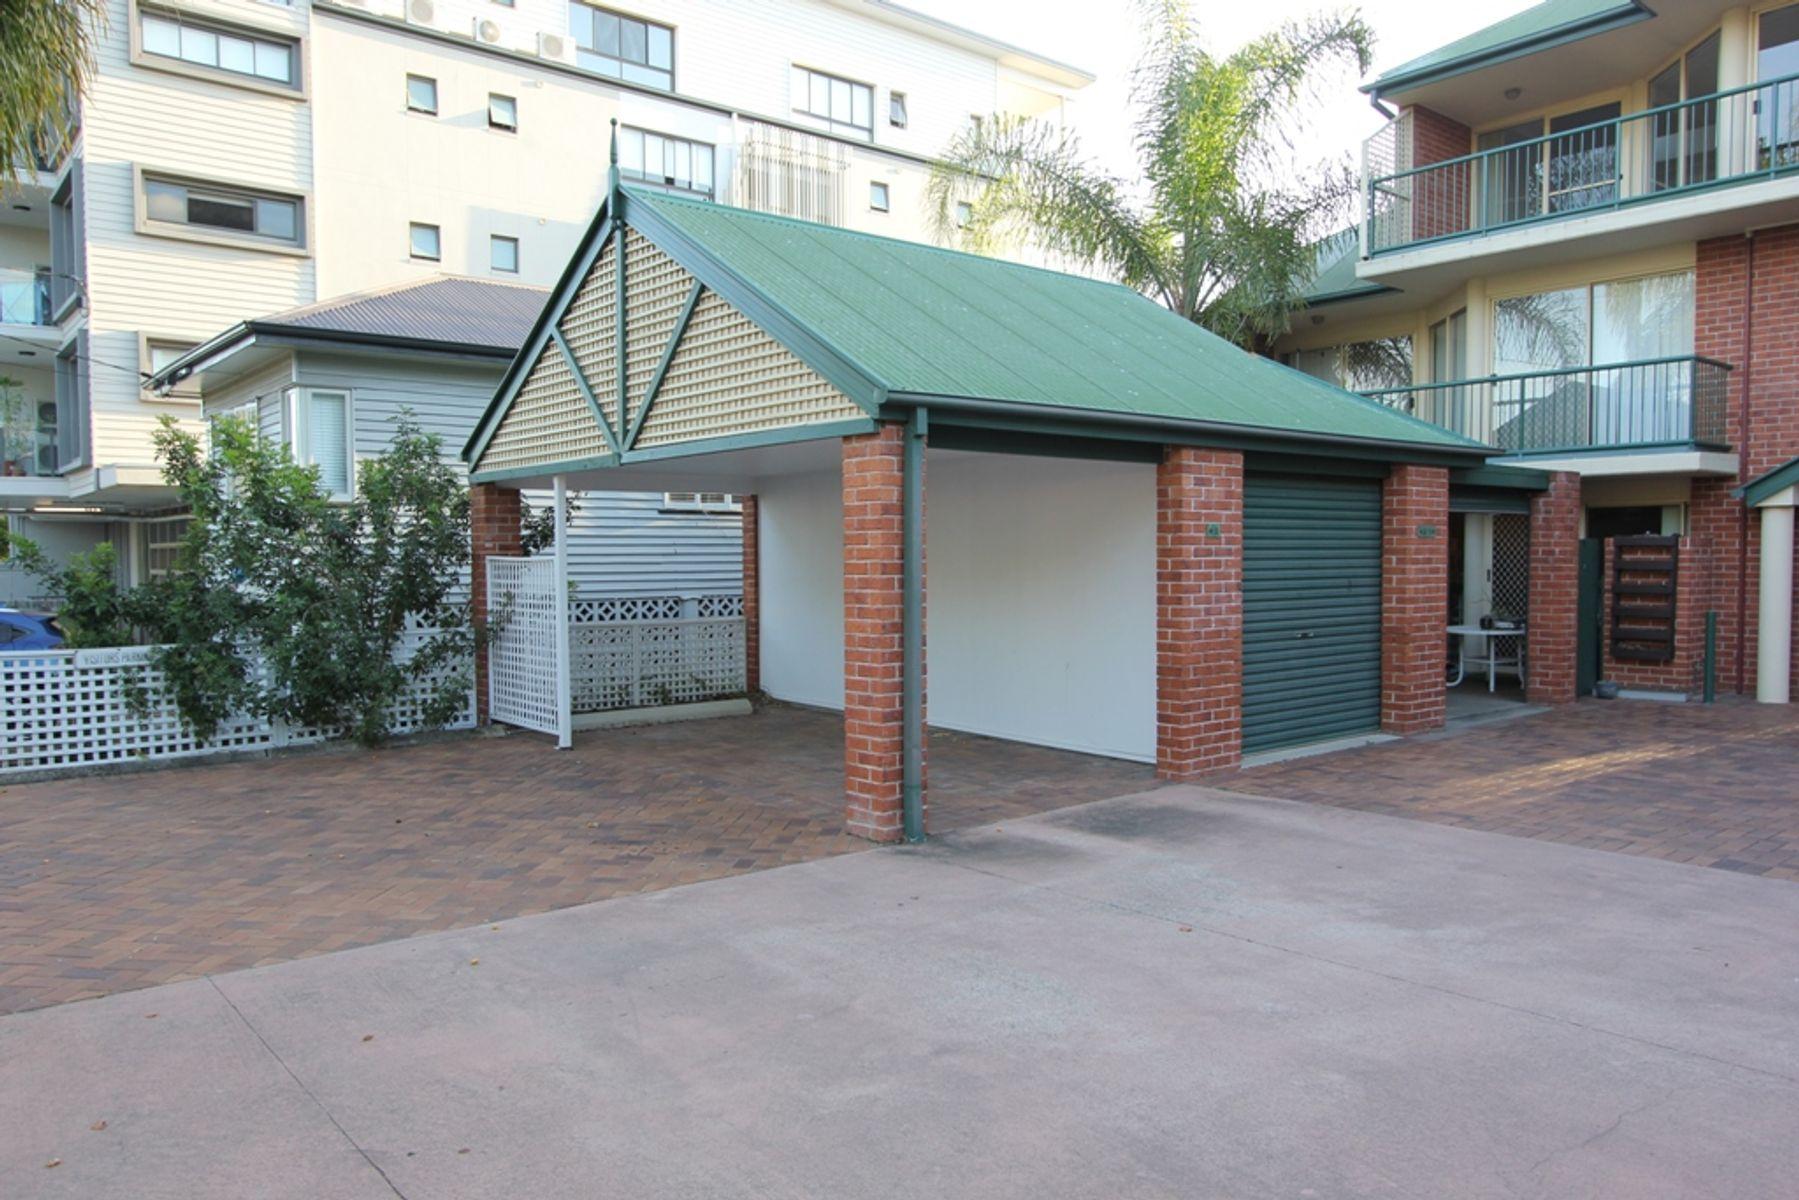 5/691 Oxley Road, Corinda, QLD 4075